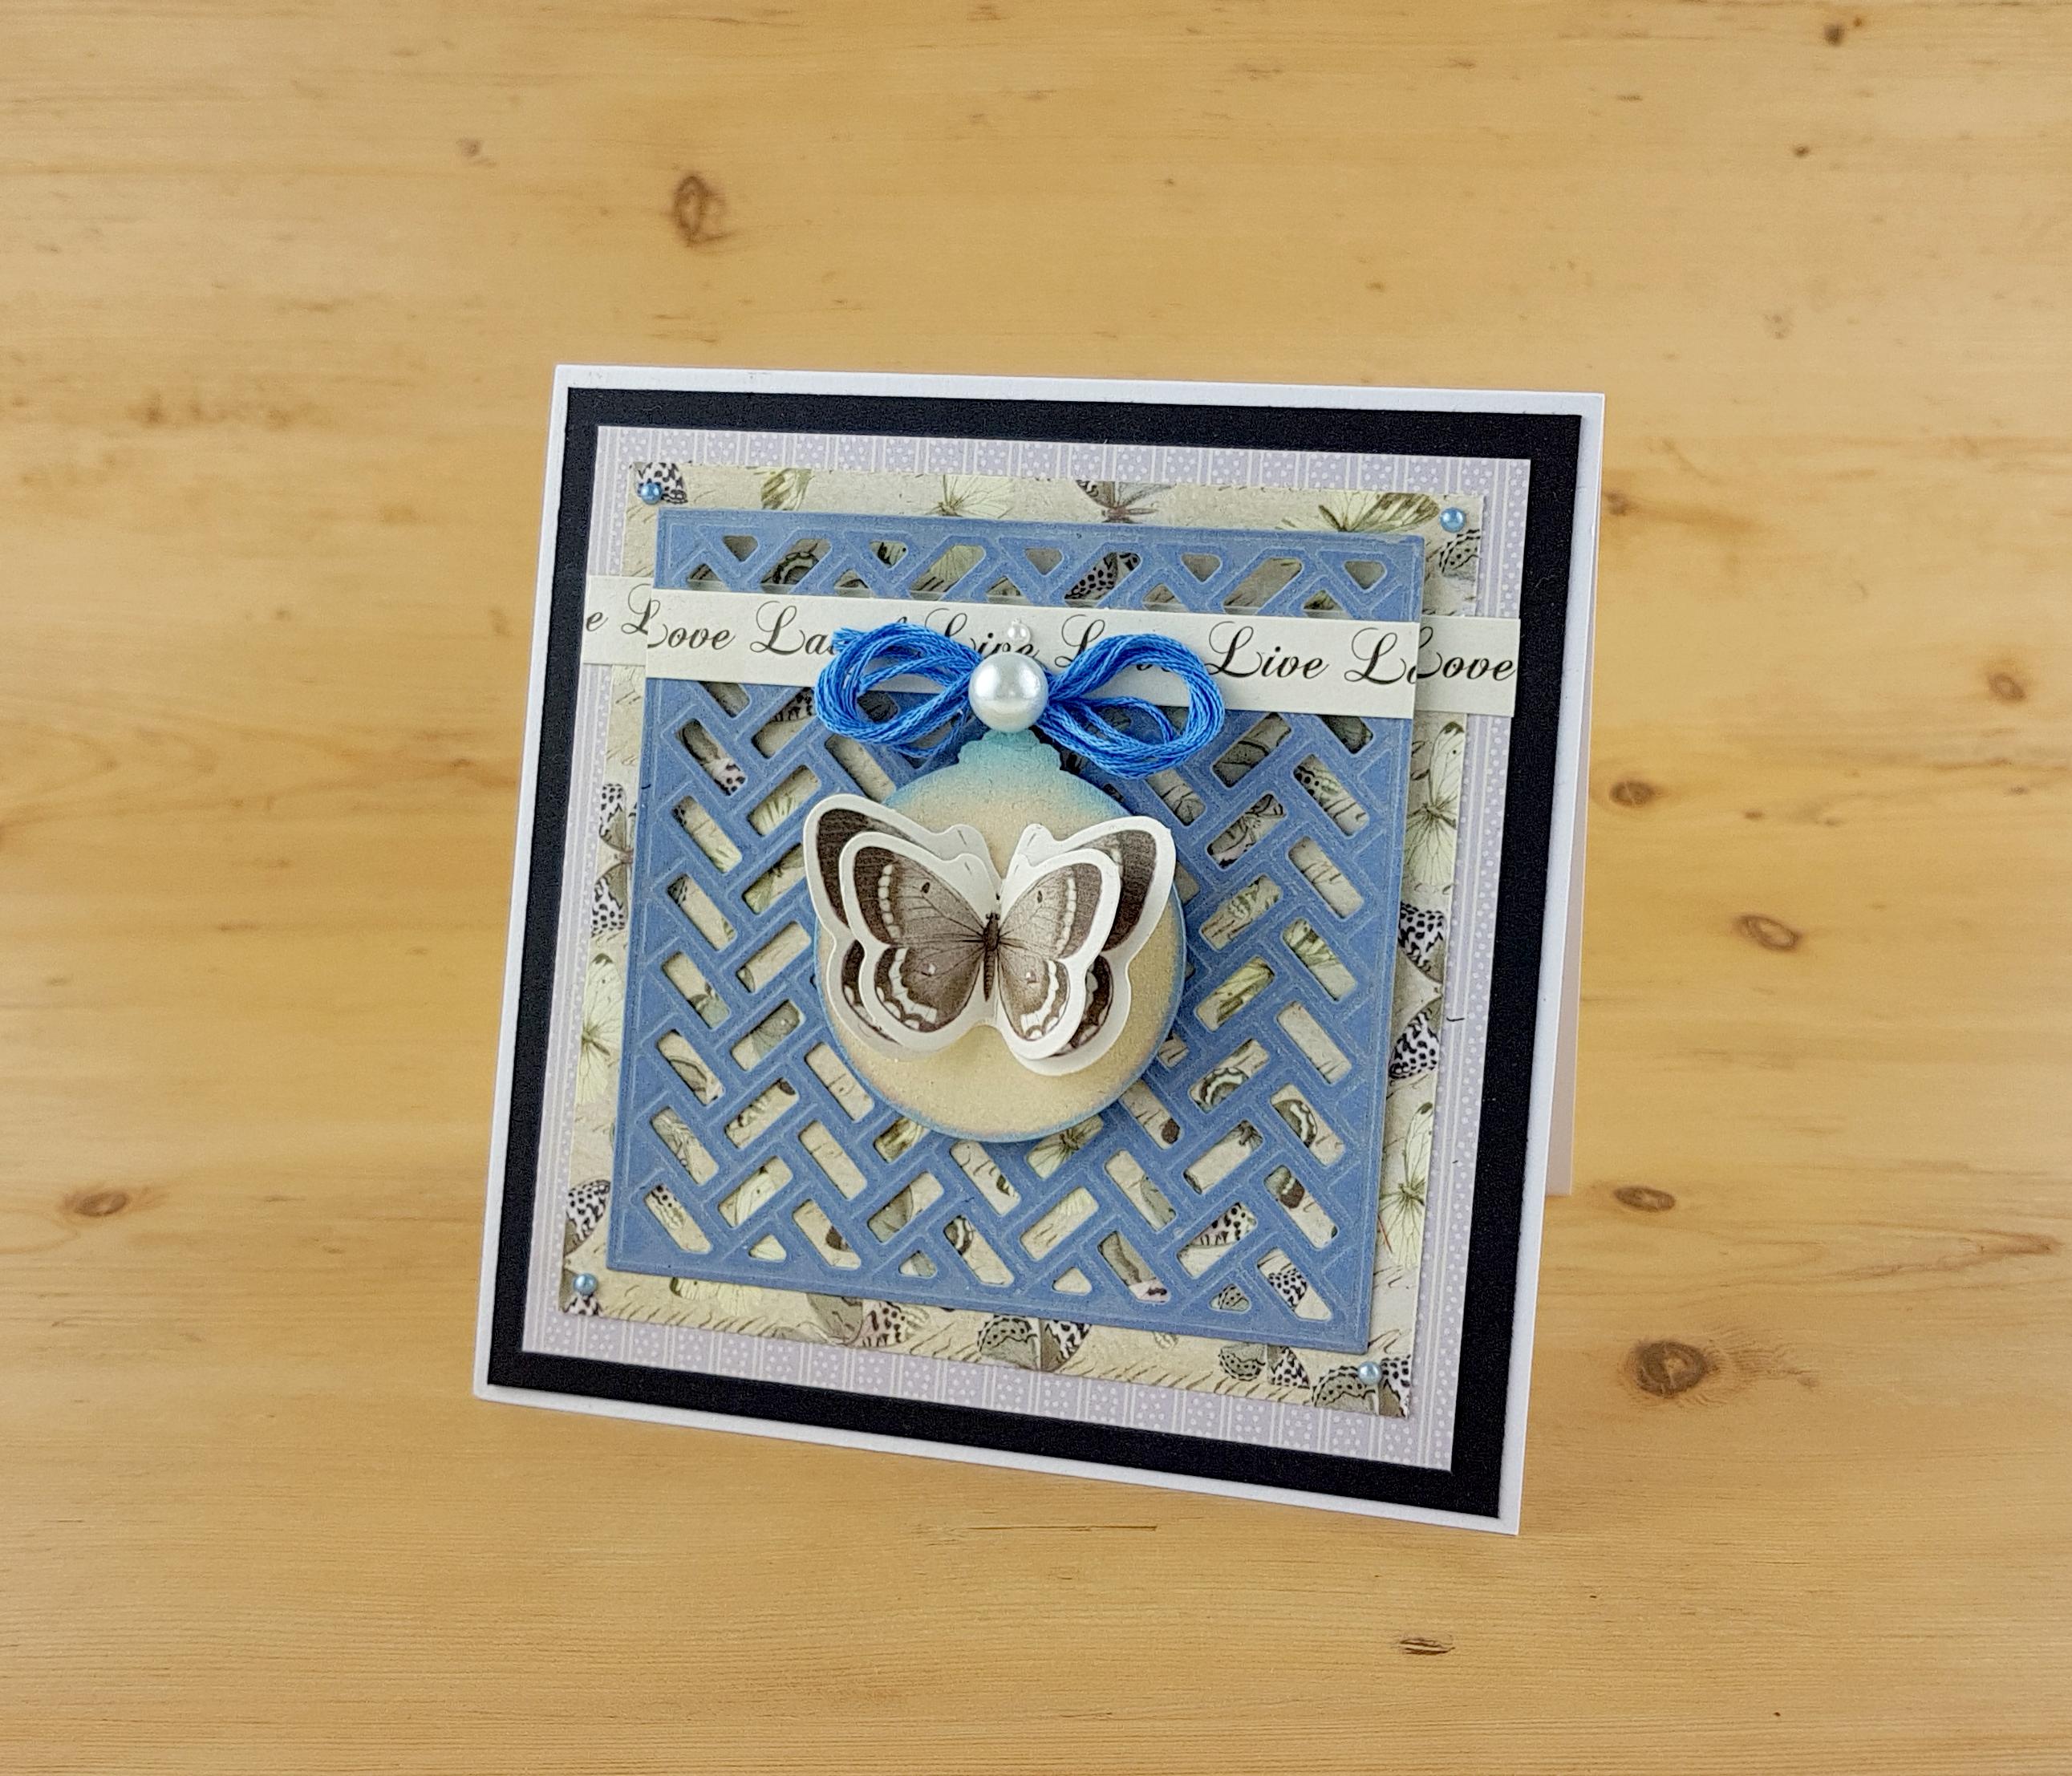 John Bloodworth Gentleman Crafter Couture Creations Parquet Tiles